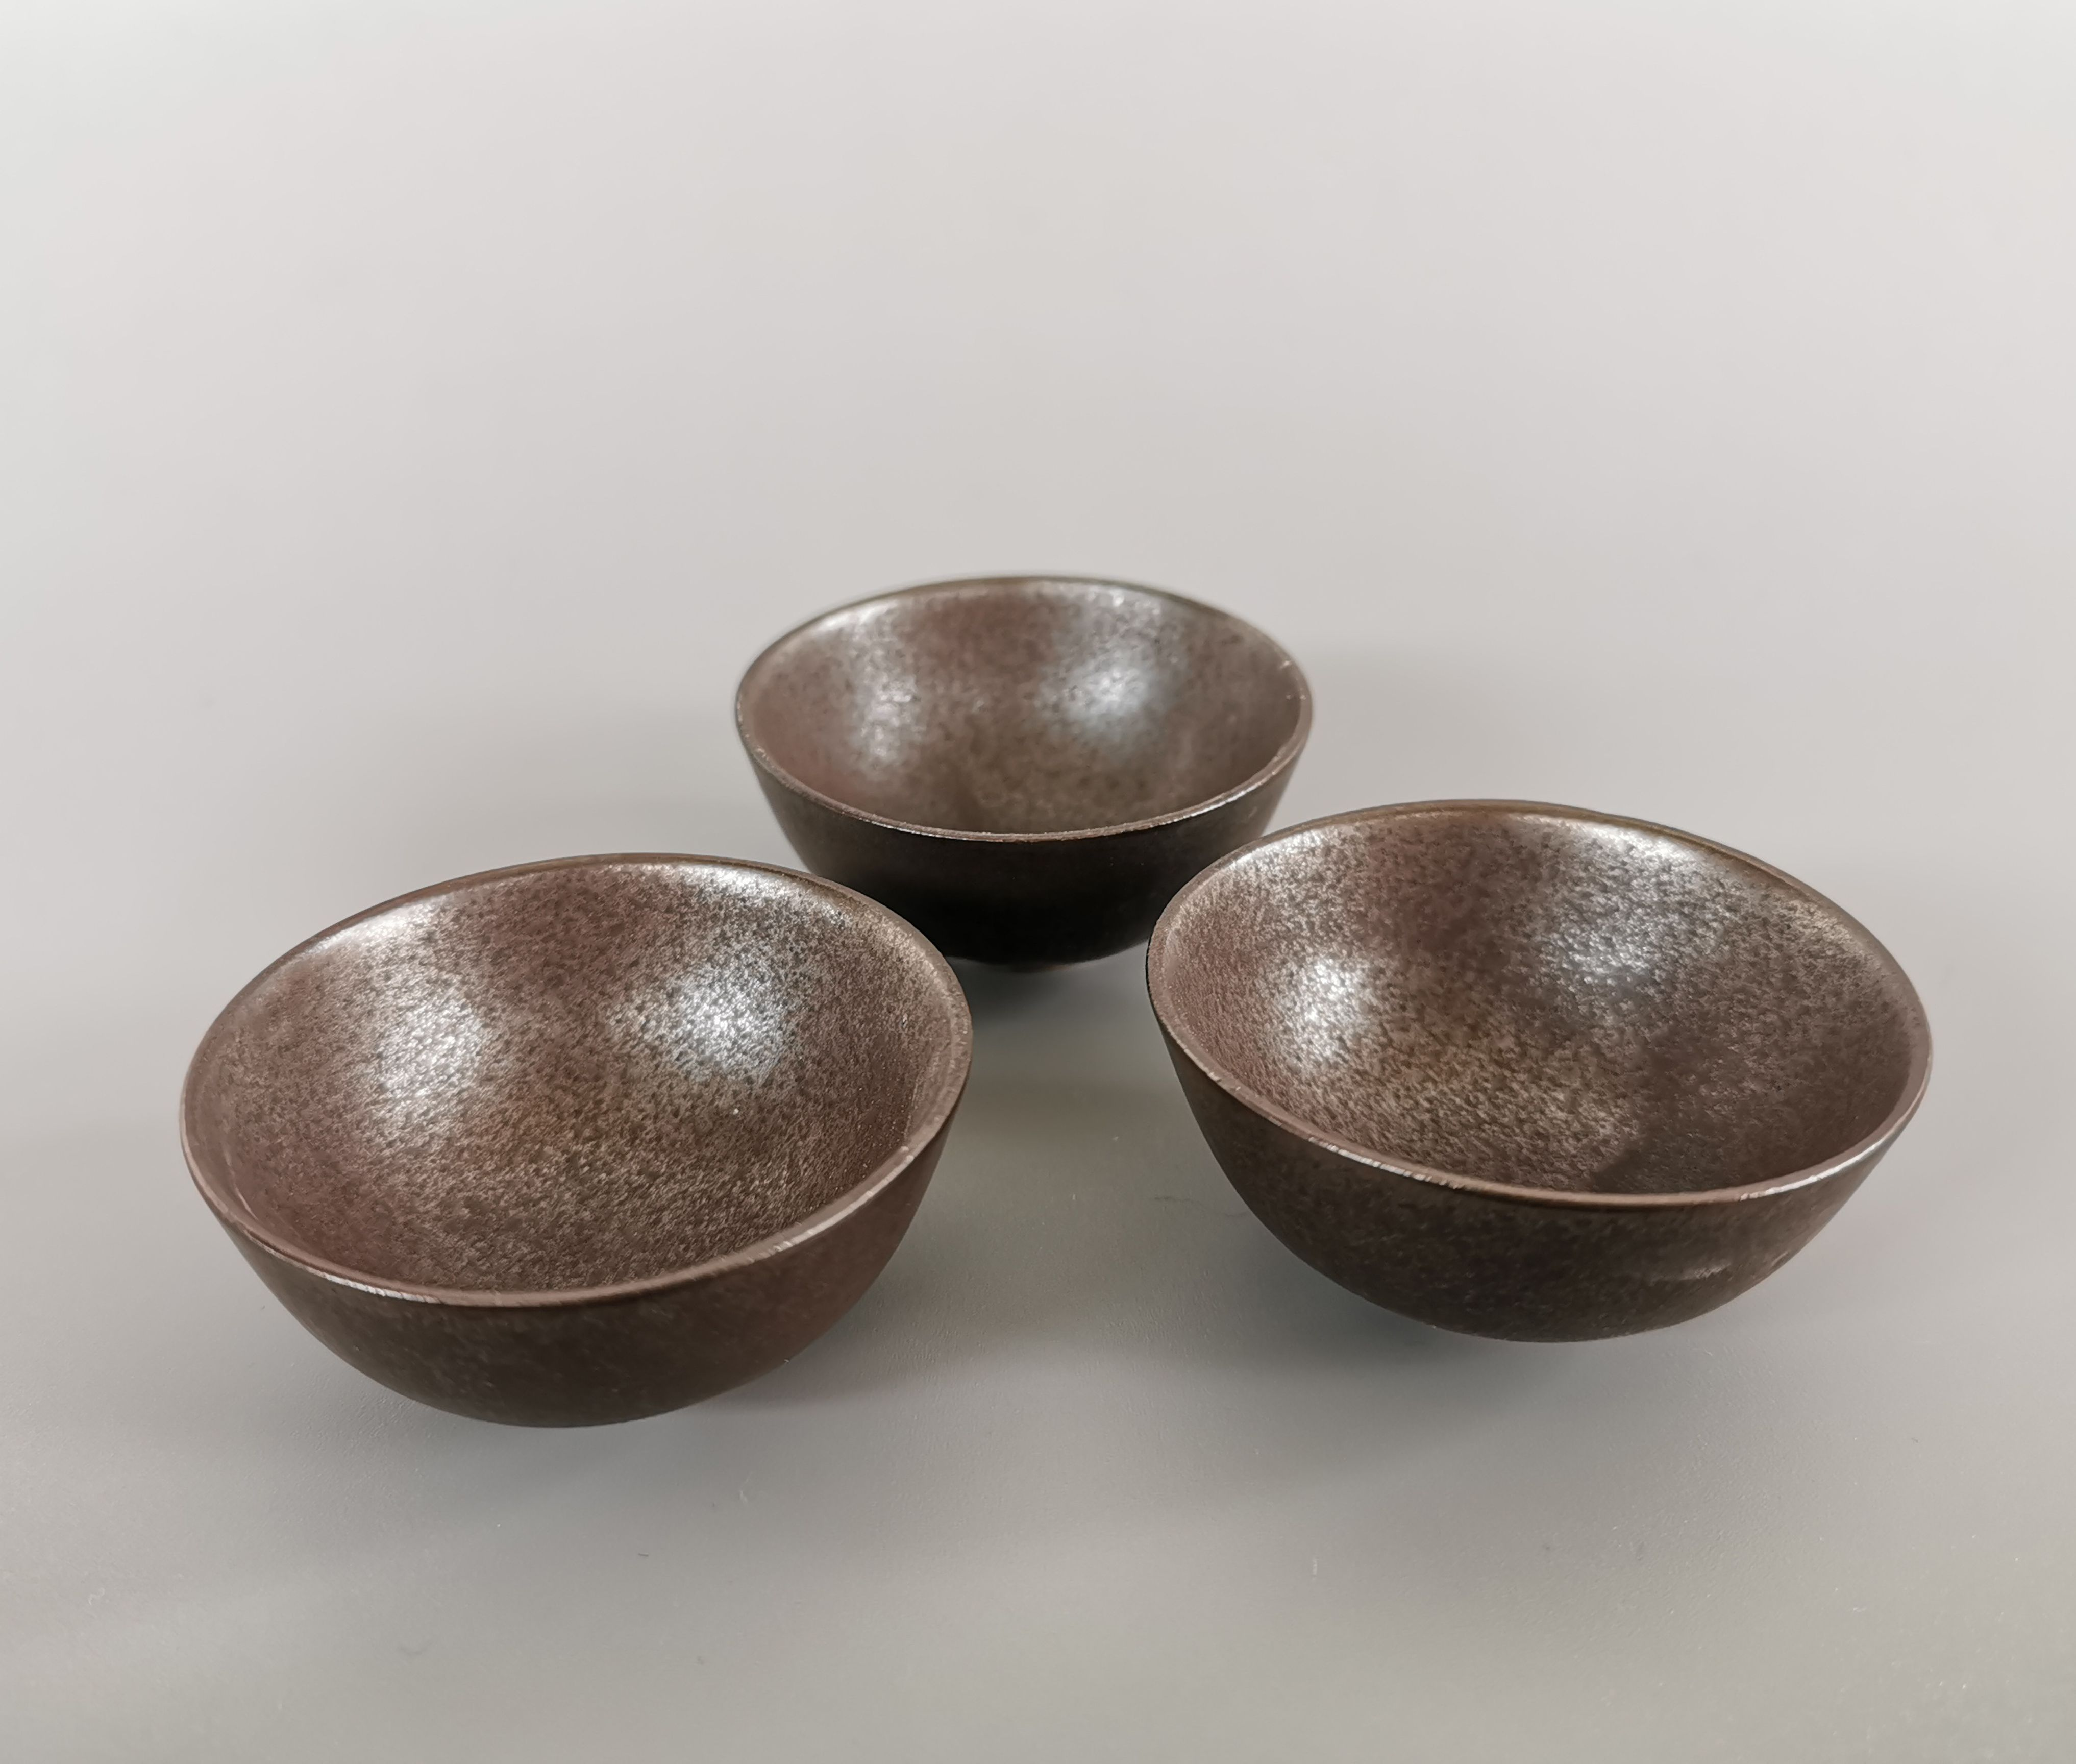 Pin By Nestella On Nordic Ceramic Tableware In 2020 Ceramic Cups Ceramic Tableware Decorative Bowls